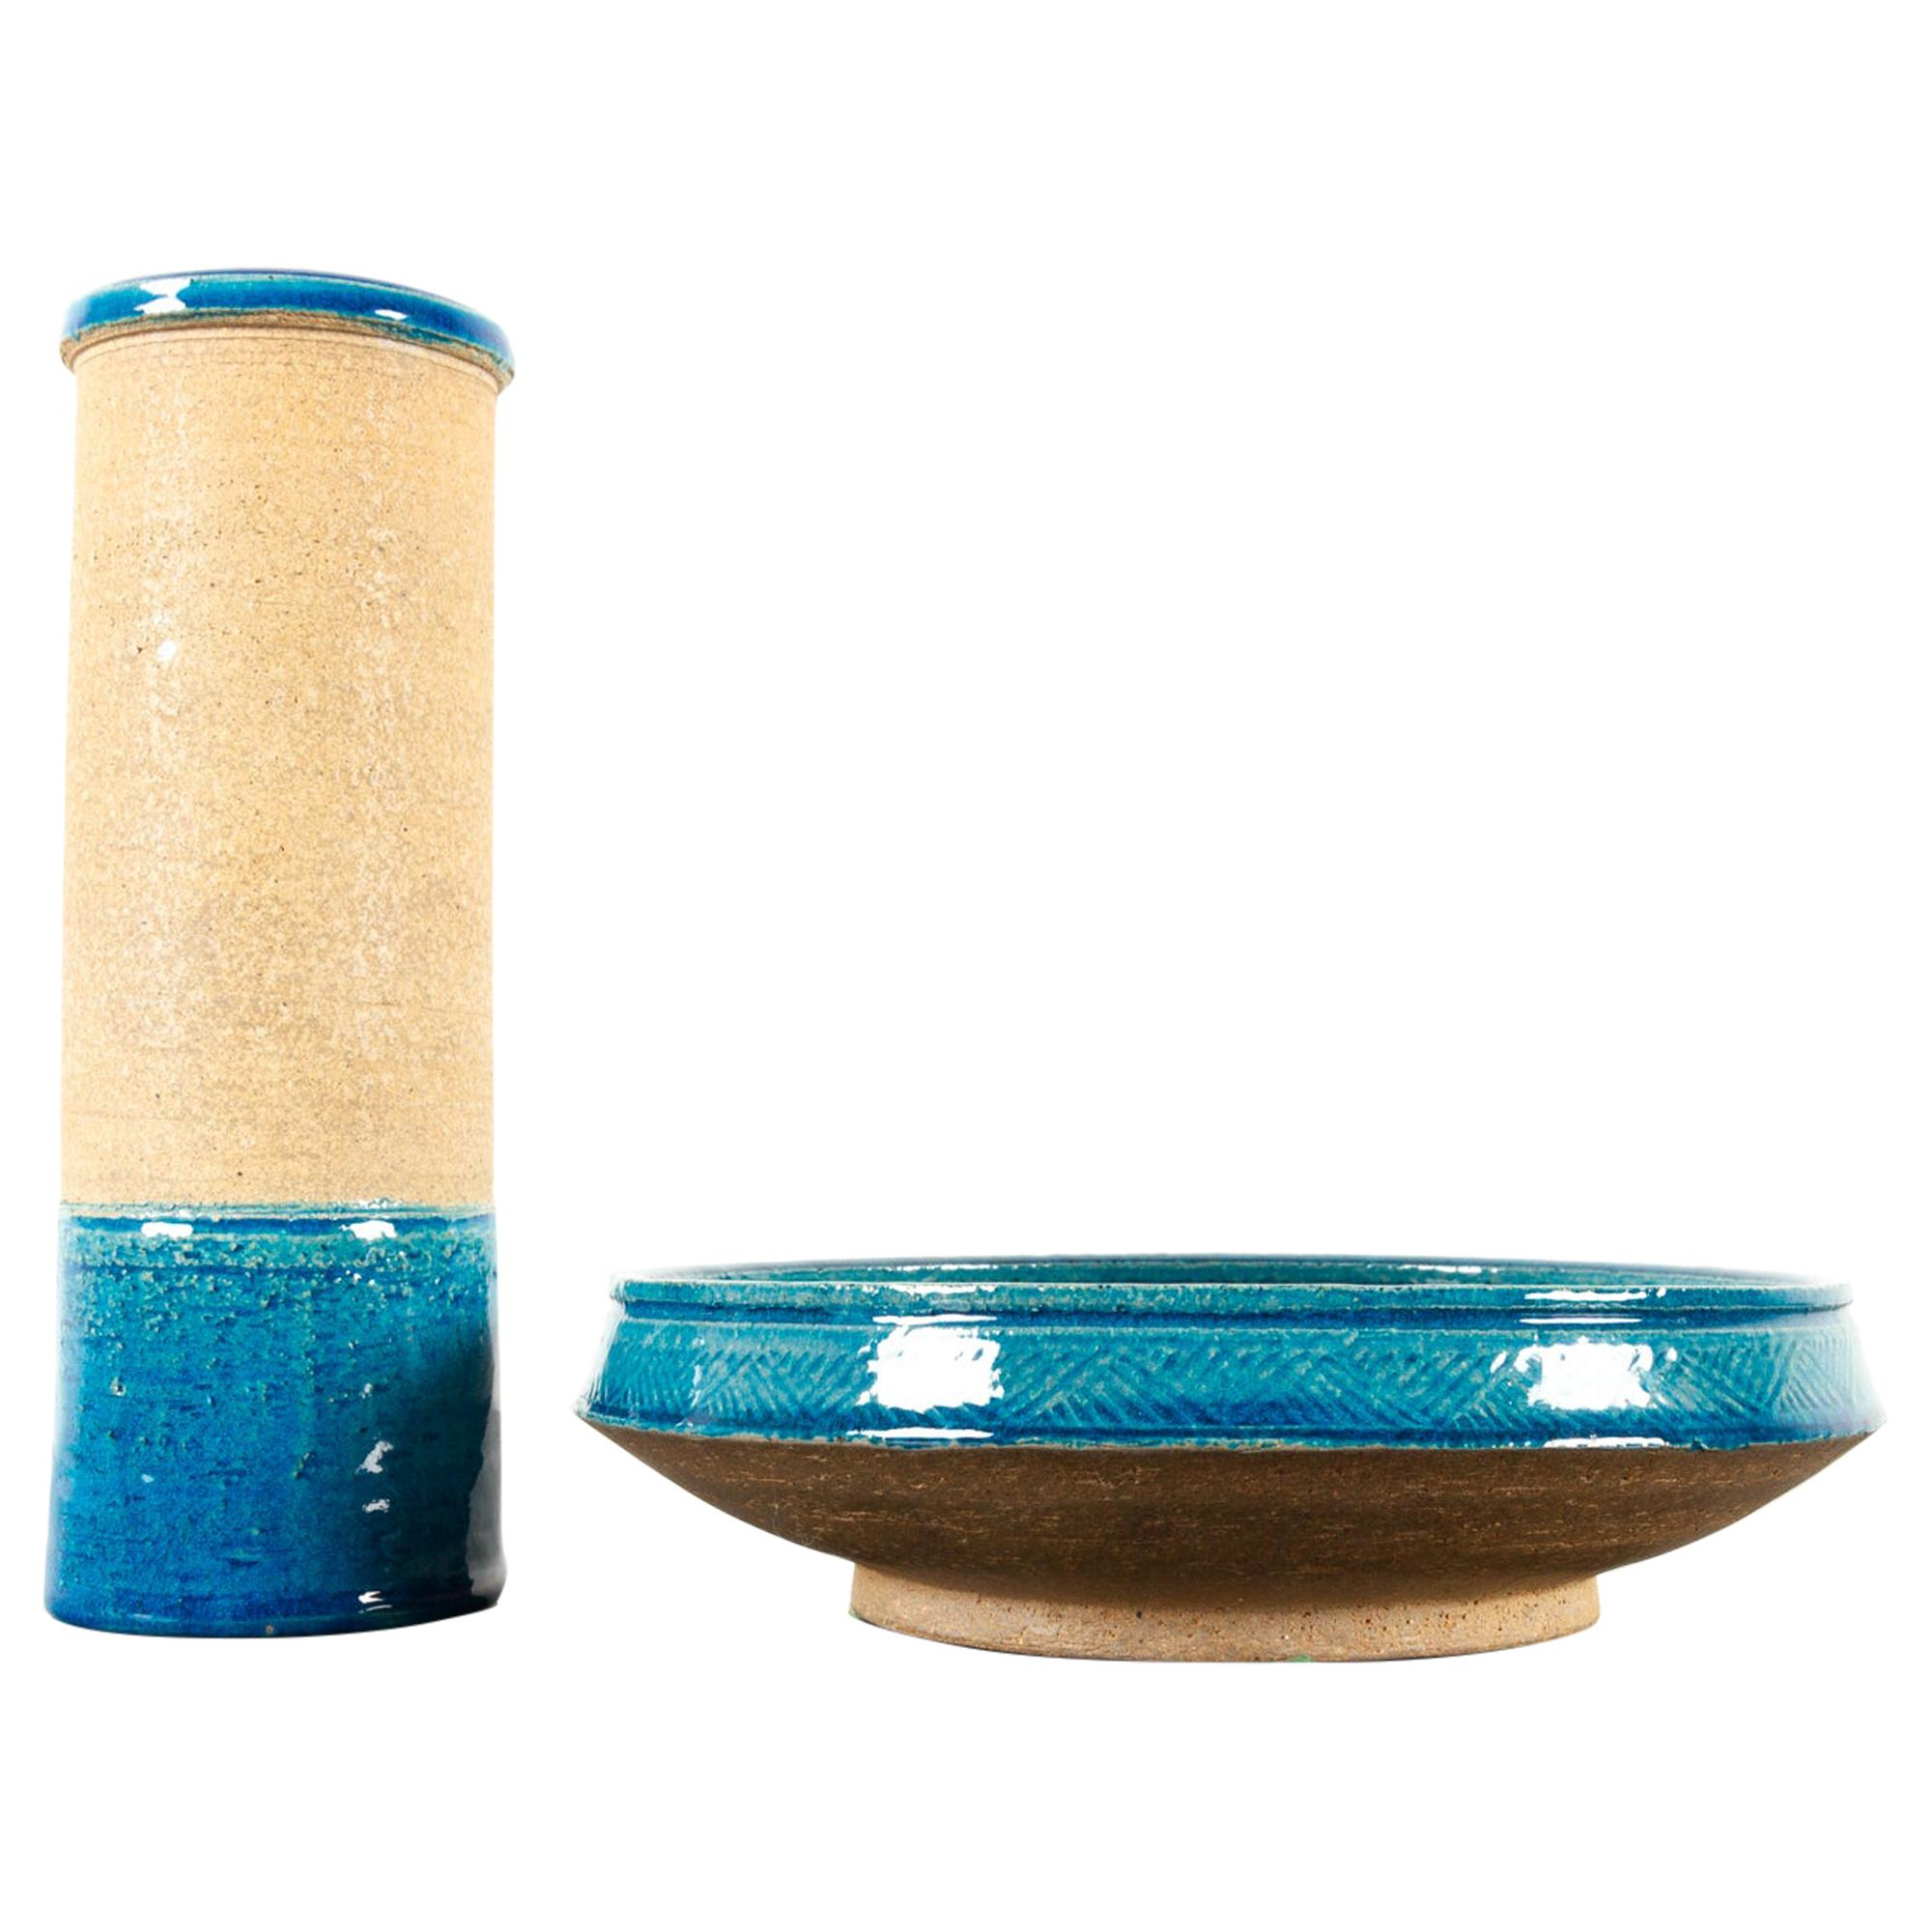 Vintage Danish Ceramic Bowl and Vase by Nils Kähler for Kähler Ceramics, 1960s